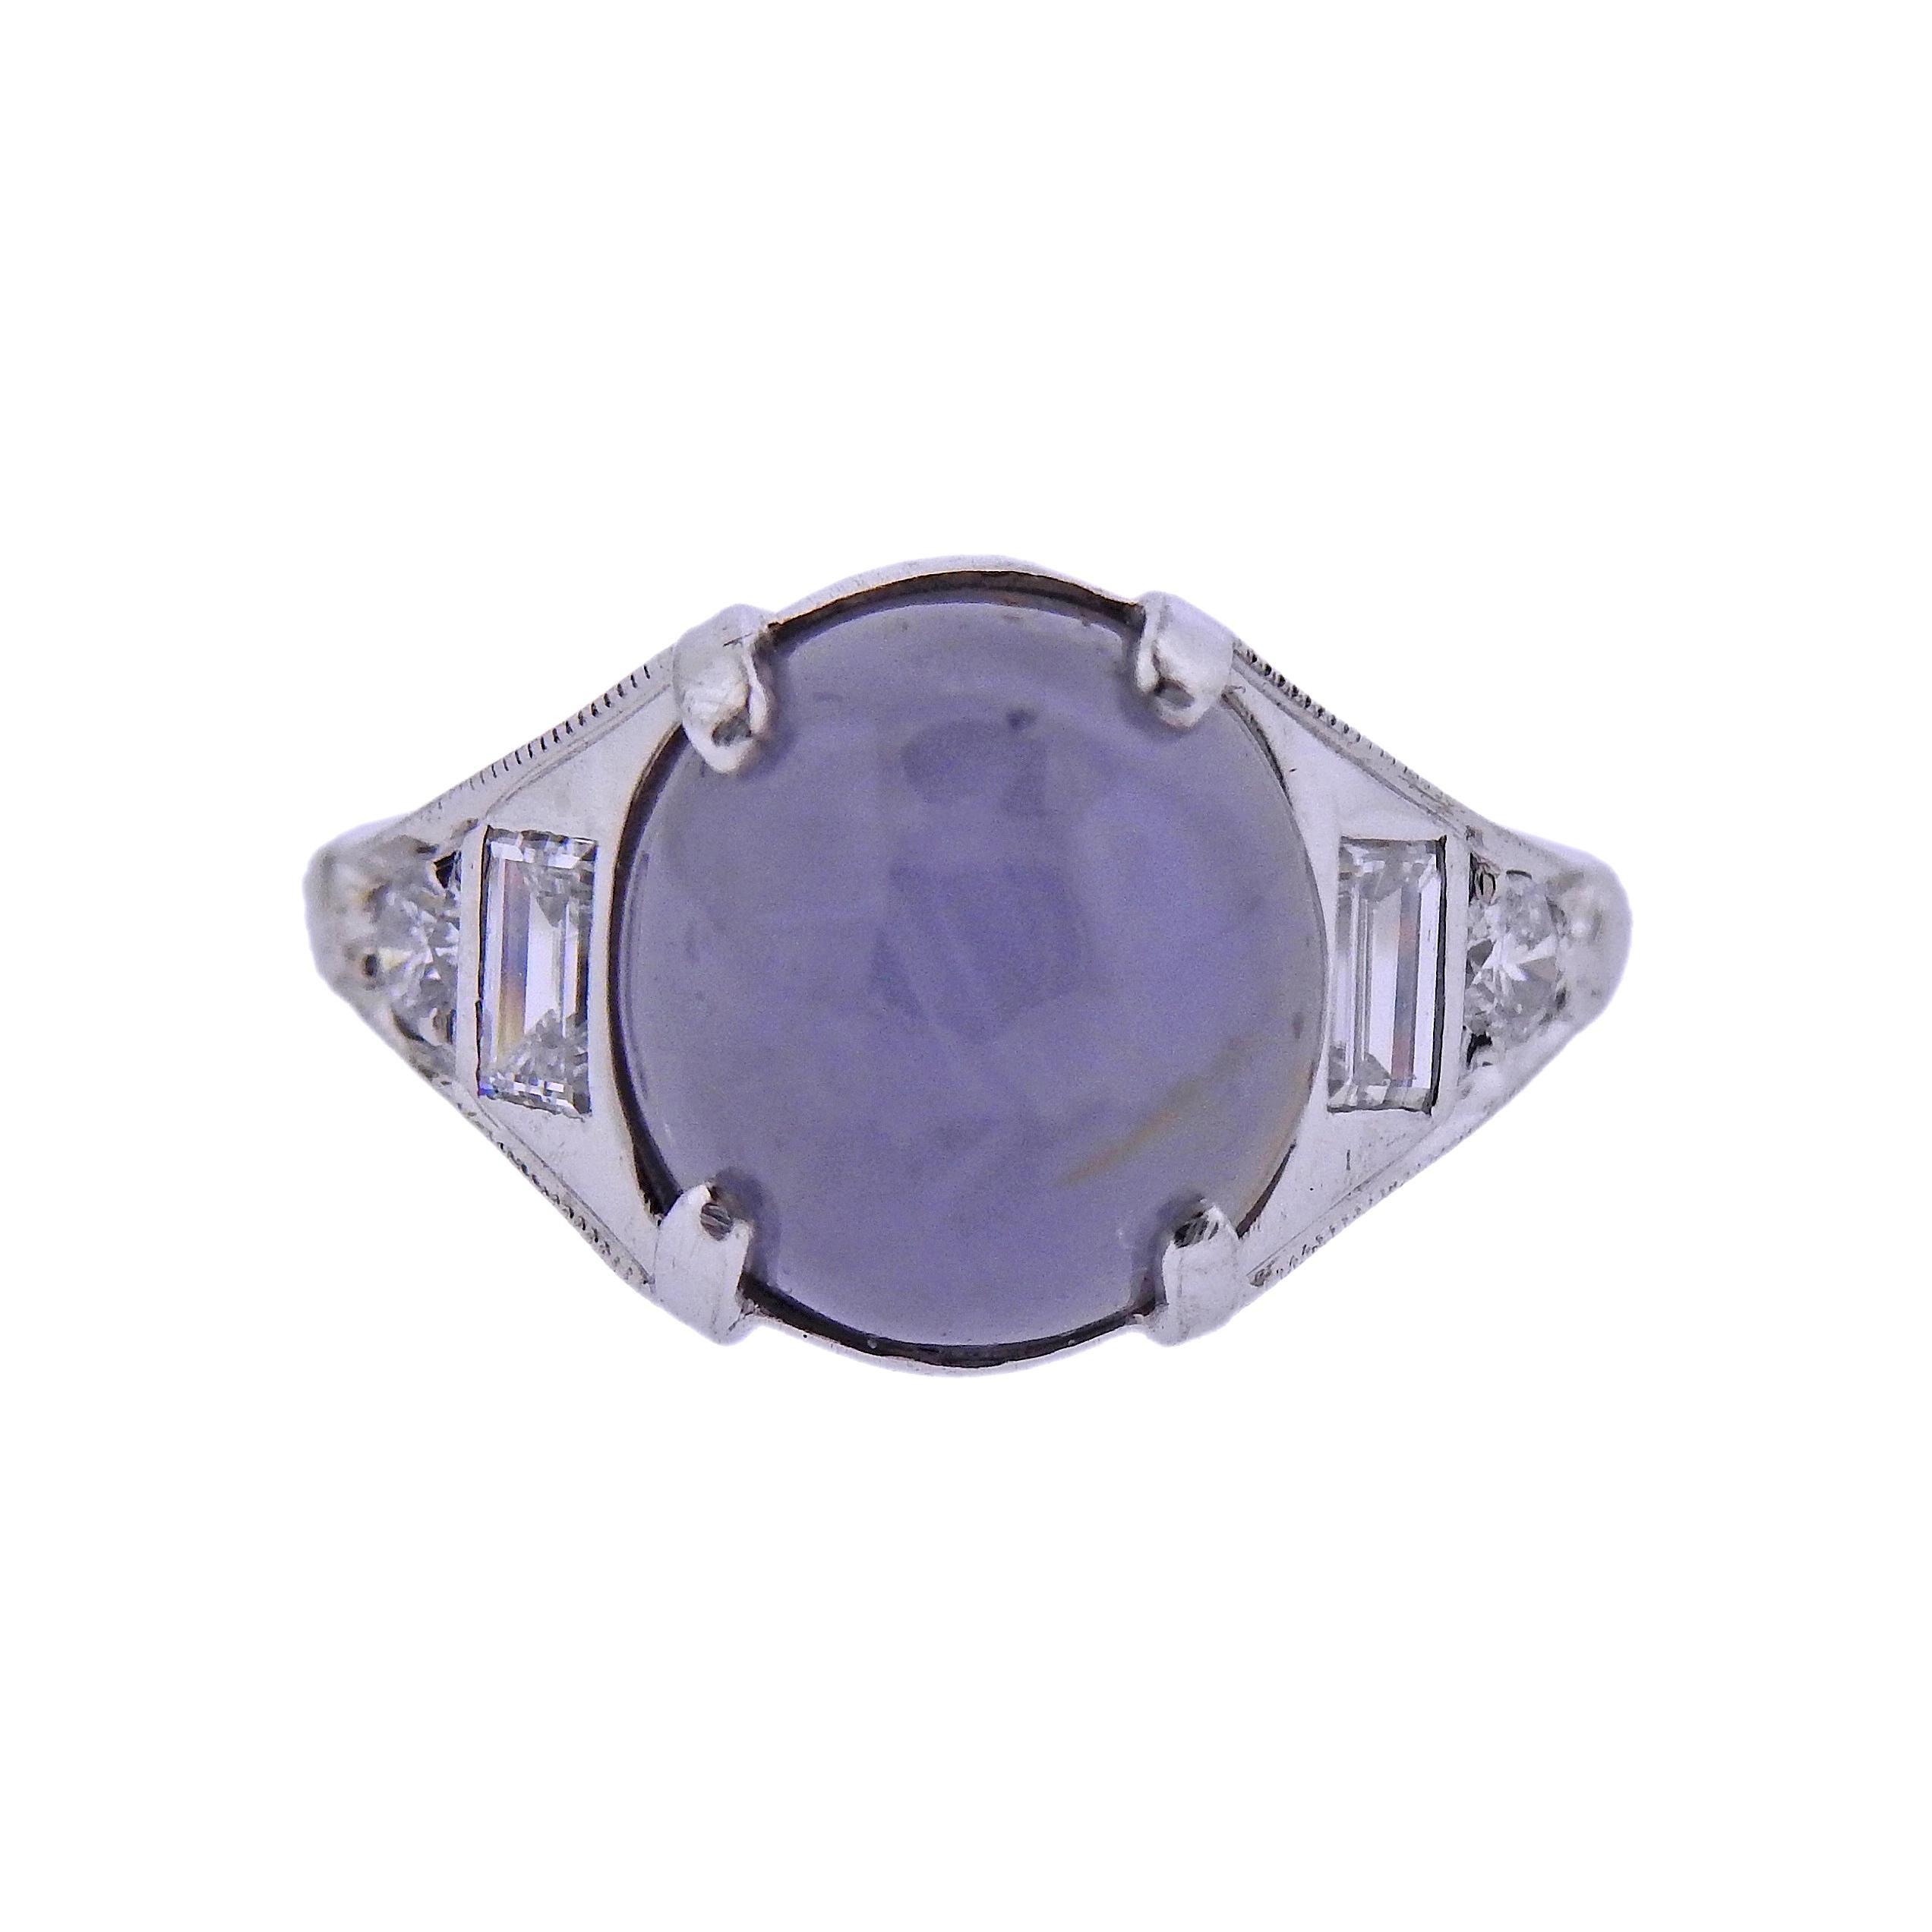 8 Carat Star Sapphire Cabochon Diamond Platinum Ring